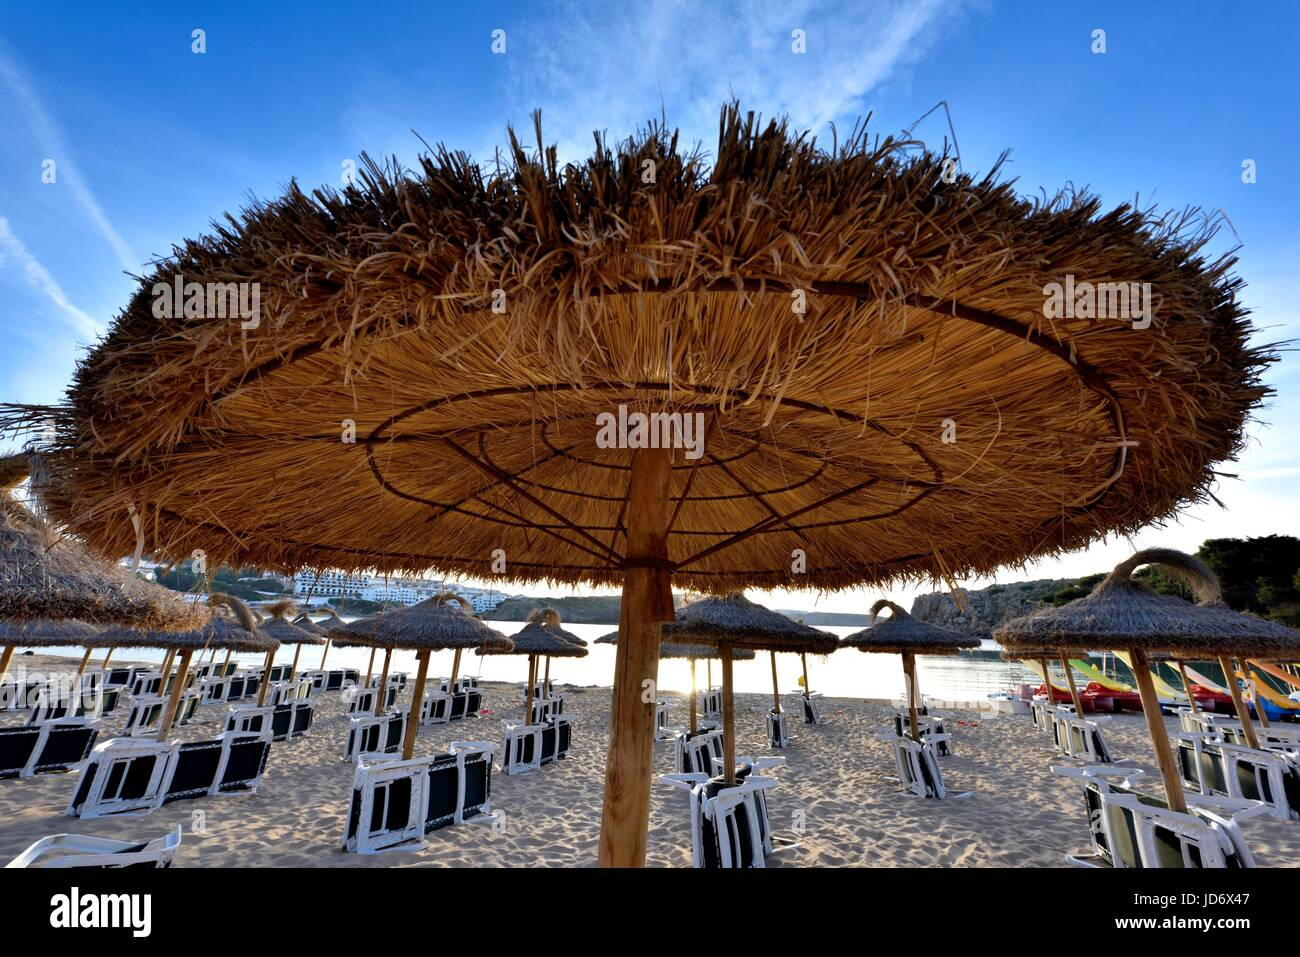 Straw parasol - Stock Image